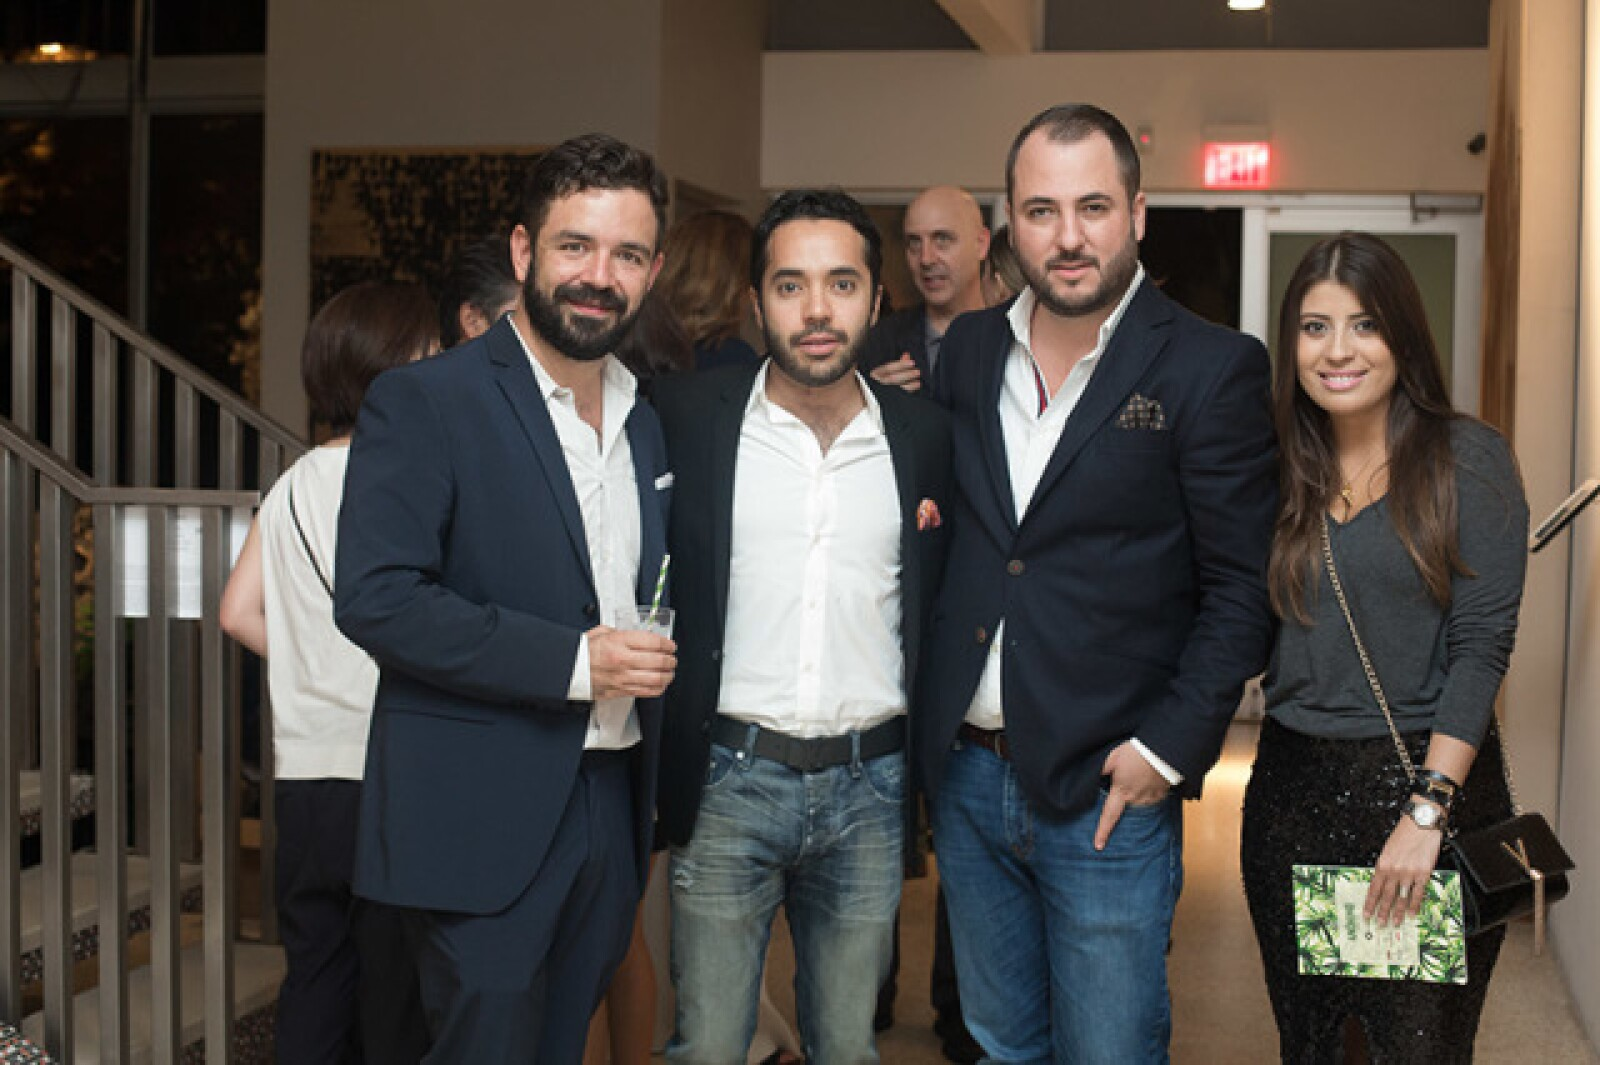 Alejandro Serratos,Alex Bracho,Víctor Martínez y Lisette Pérez Coutiño